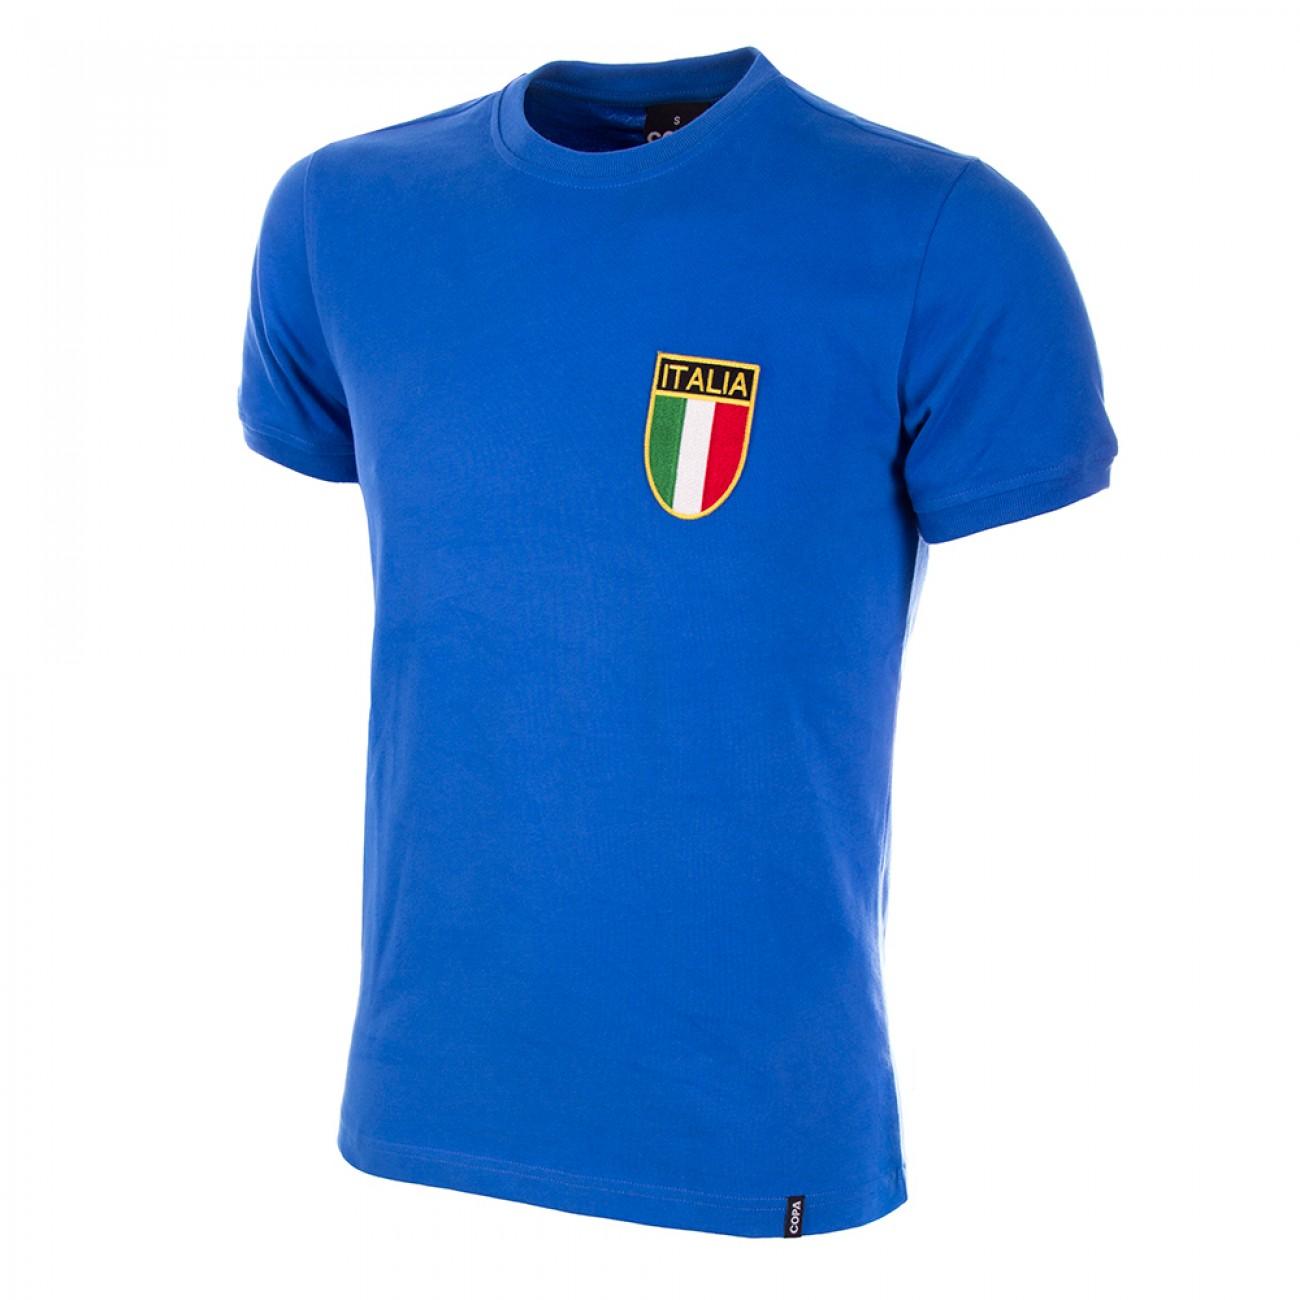 http://www.retrofootball.es/ropa-de-futbol/camiseta-italia-1968-1970.html